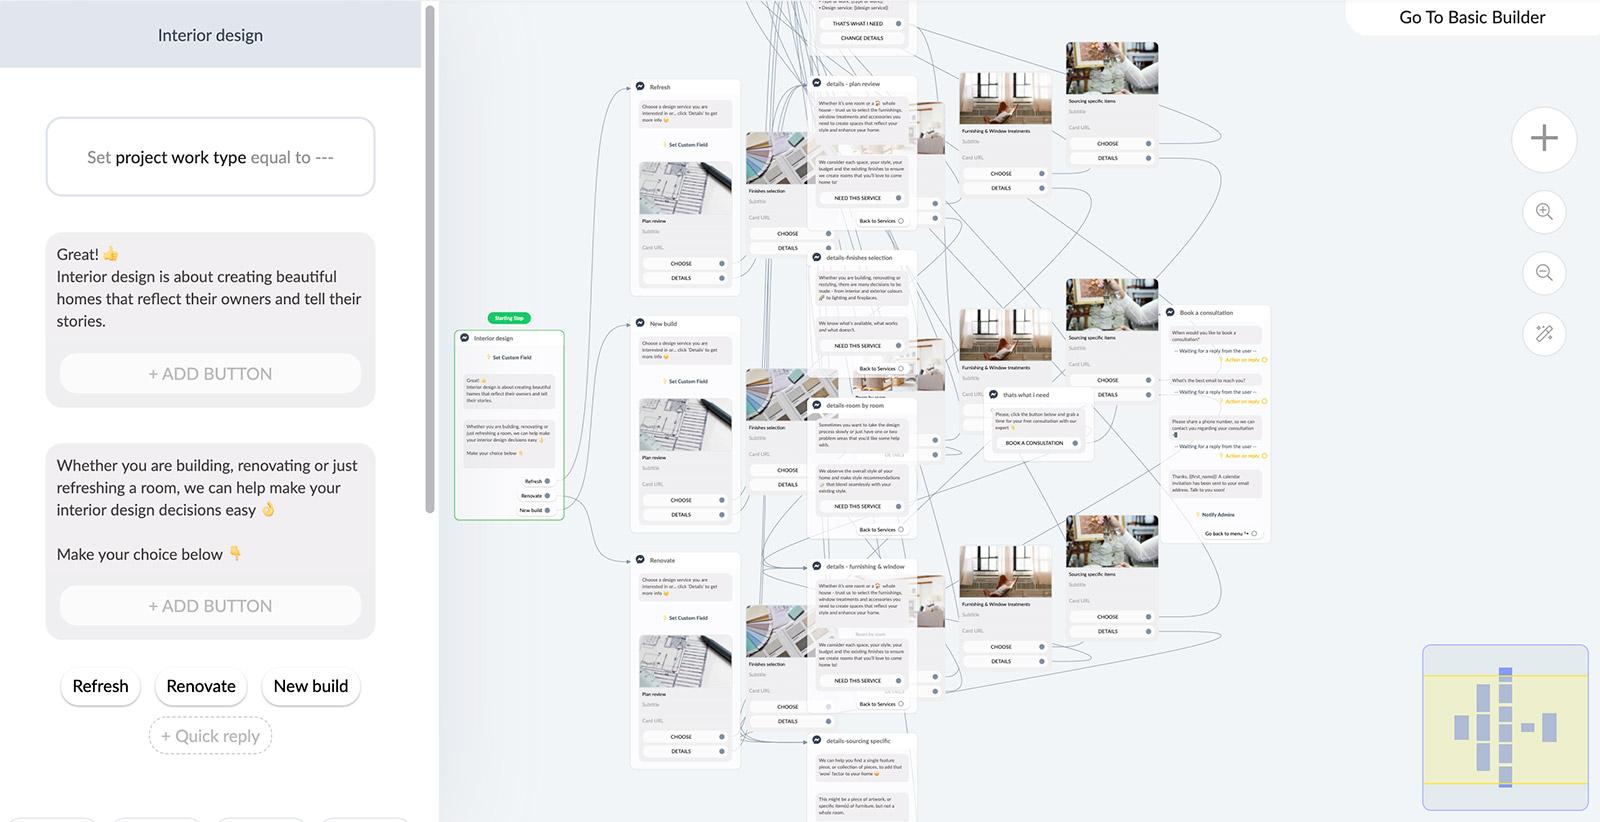 silfer-bots-visual-flow-builder